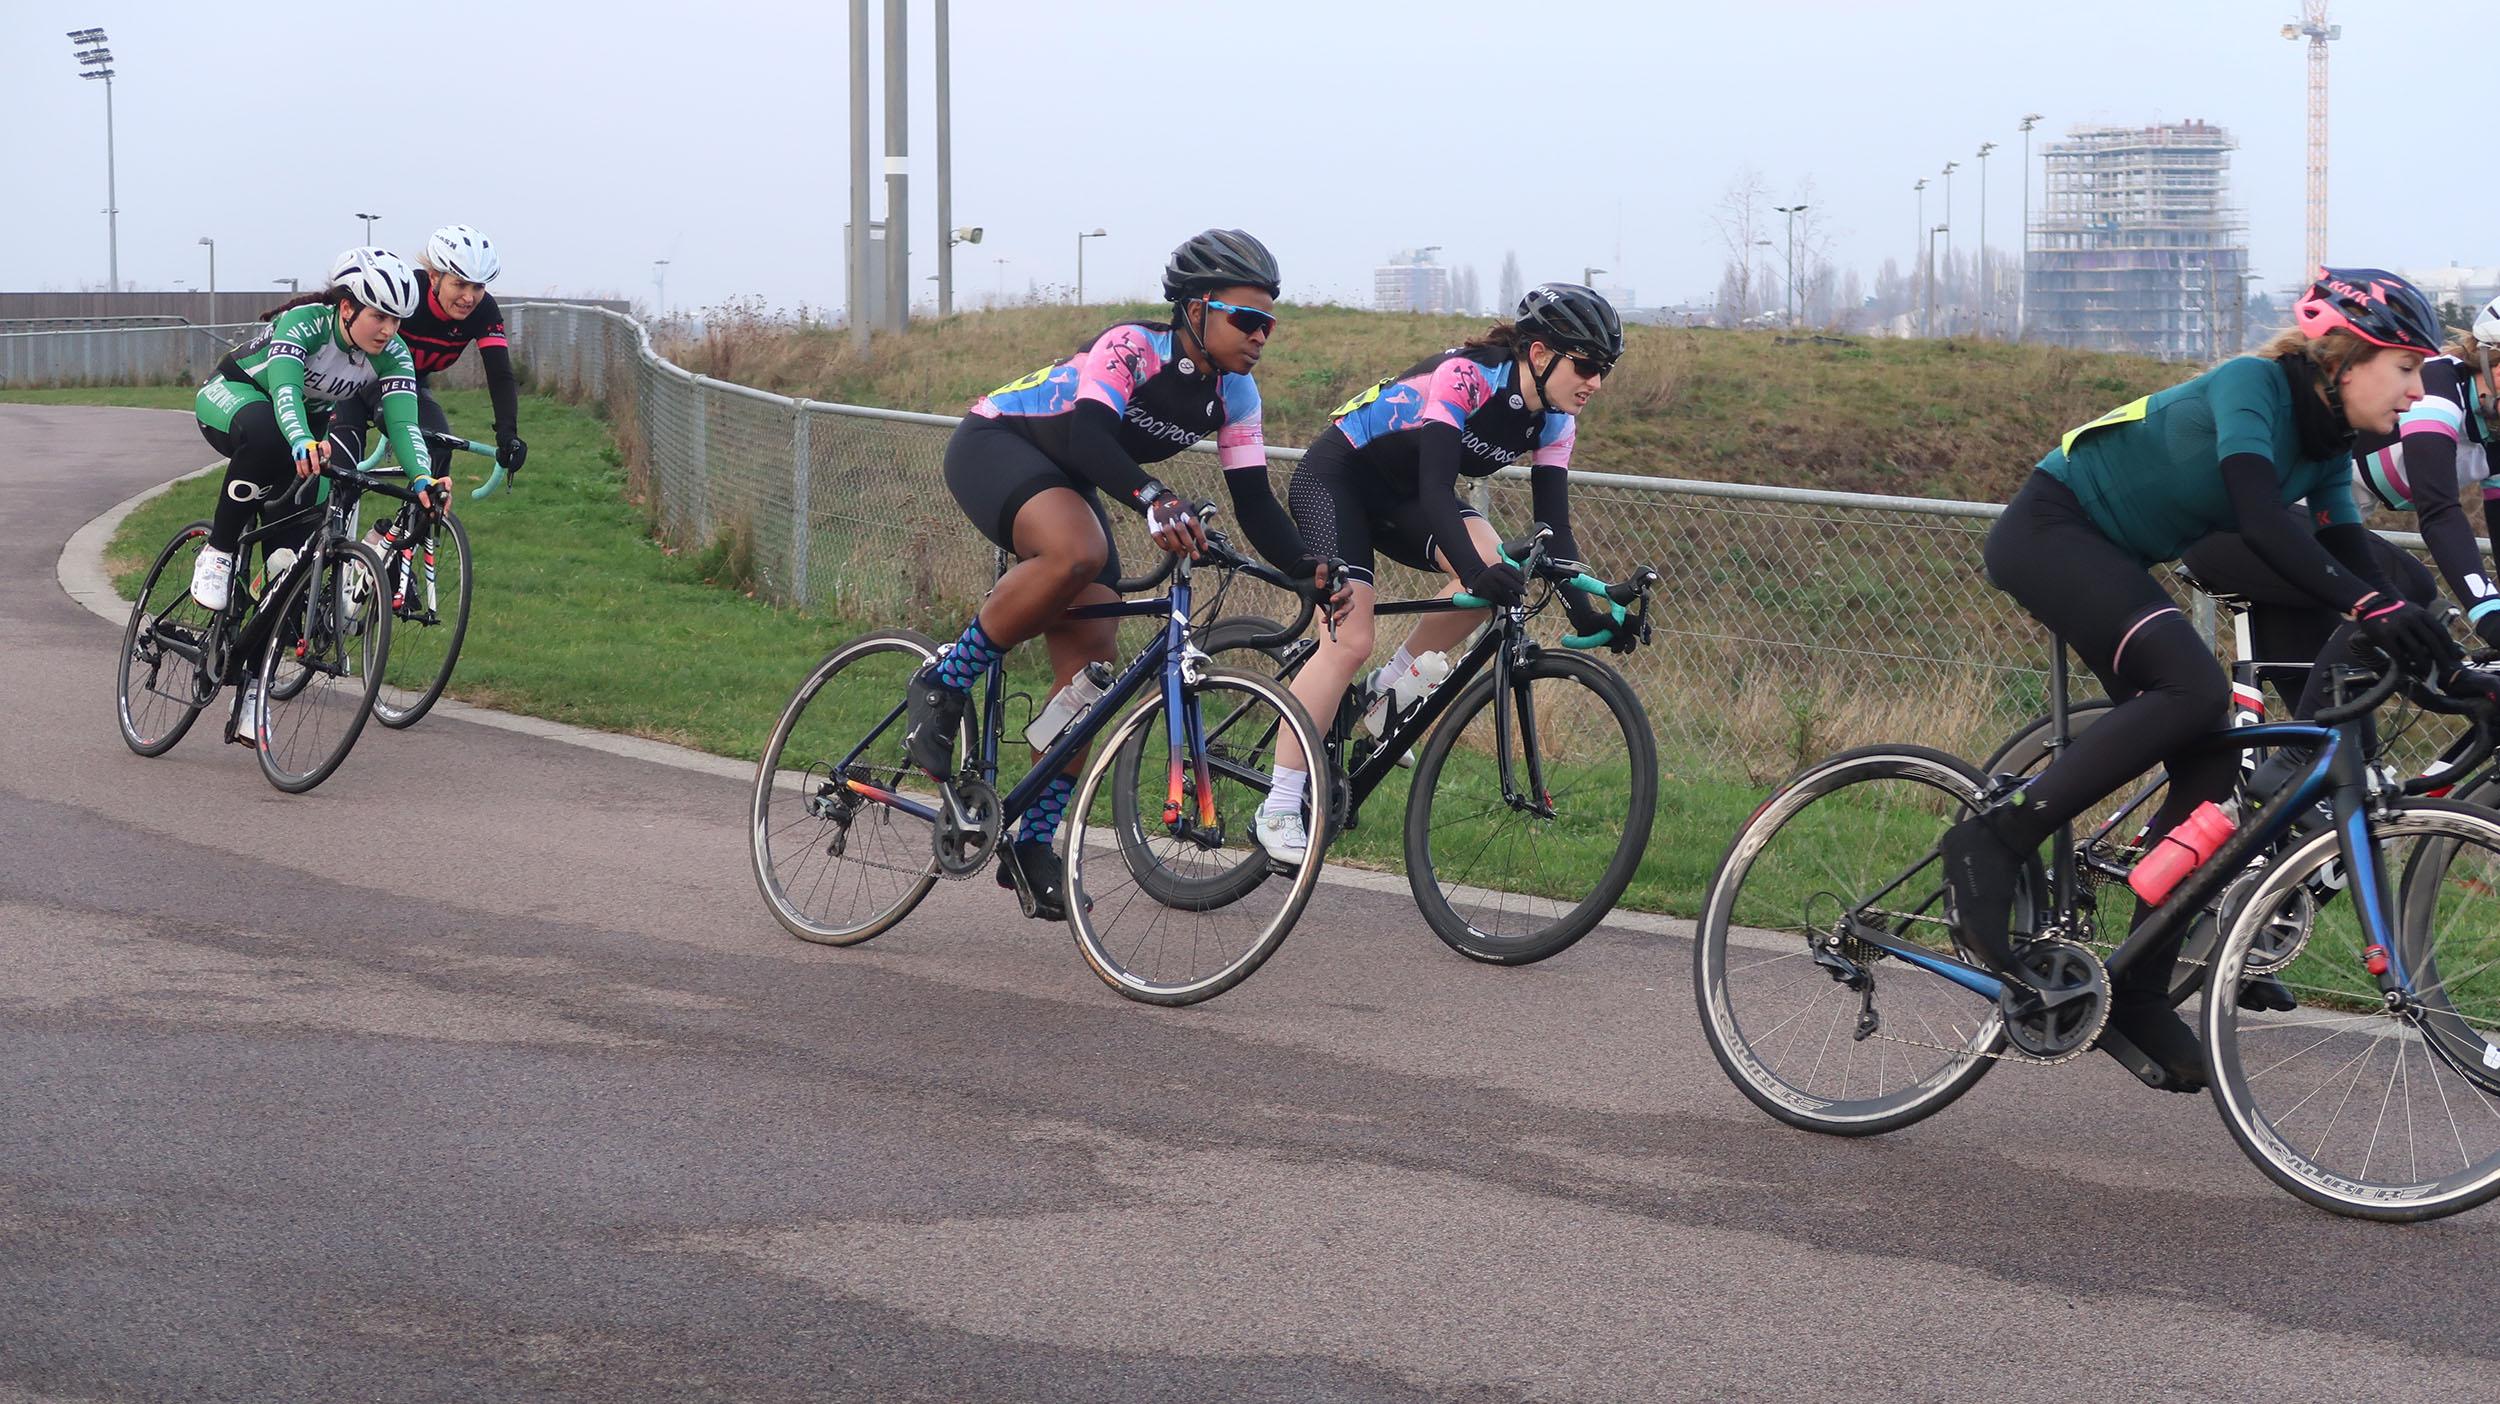 velociposse_womens_cycling.jpg